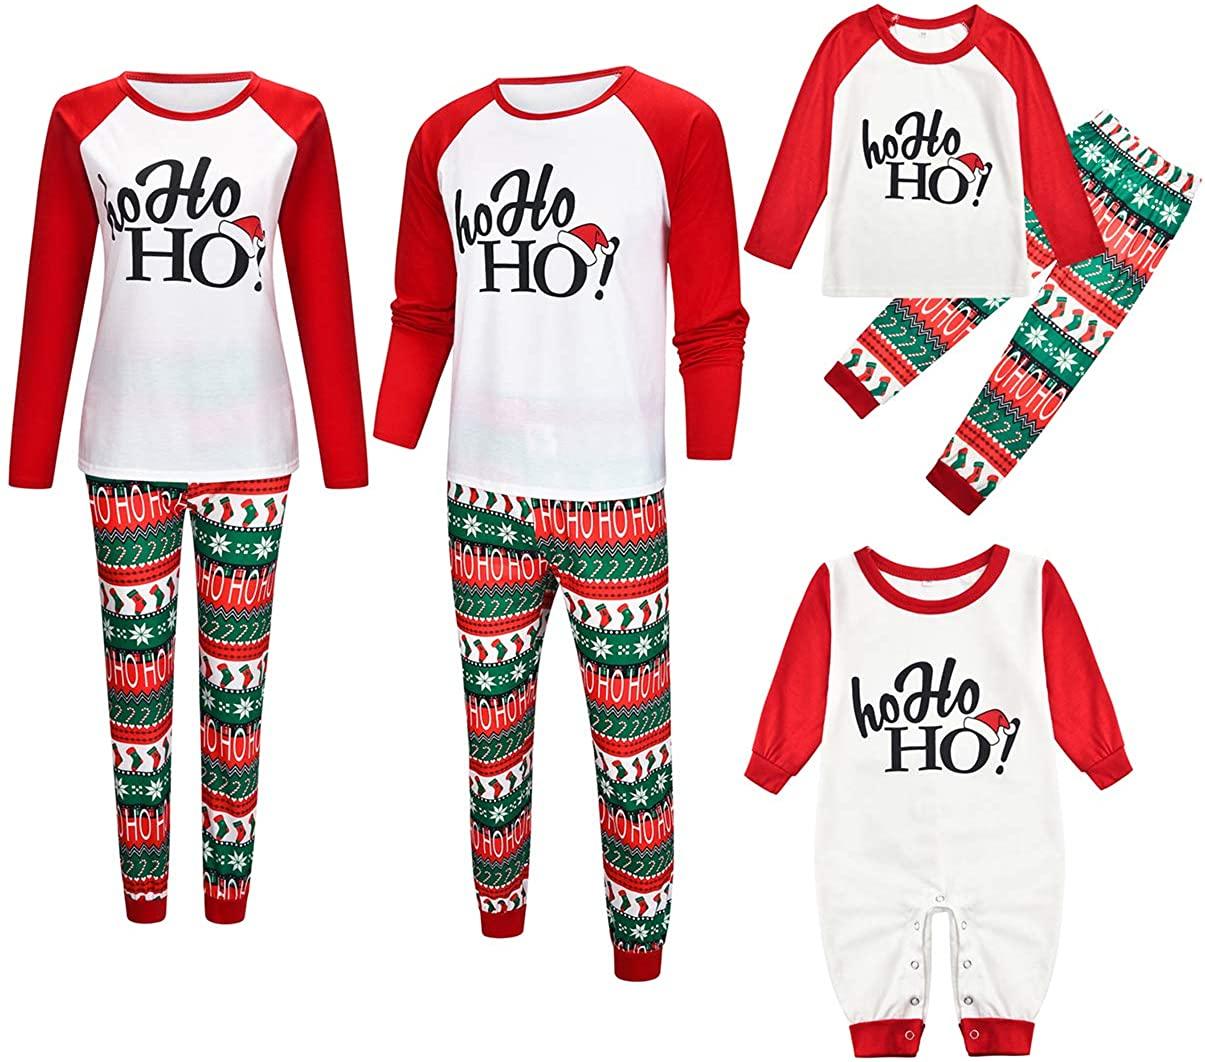 Family Matching Christmas Pajamas Set for Couples Women Men Boy Girl Pjs Nightwear Xmas Sleepwear Clothes Set